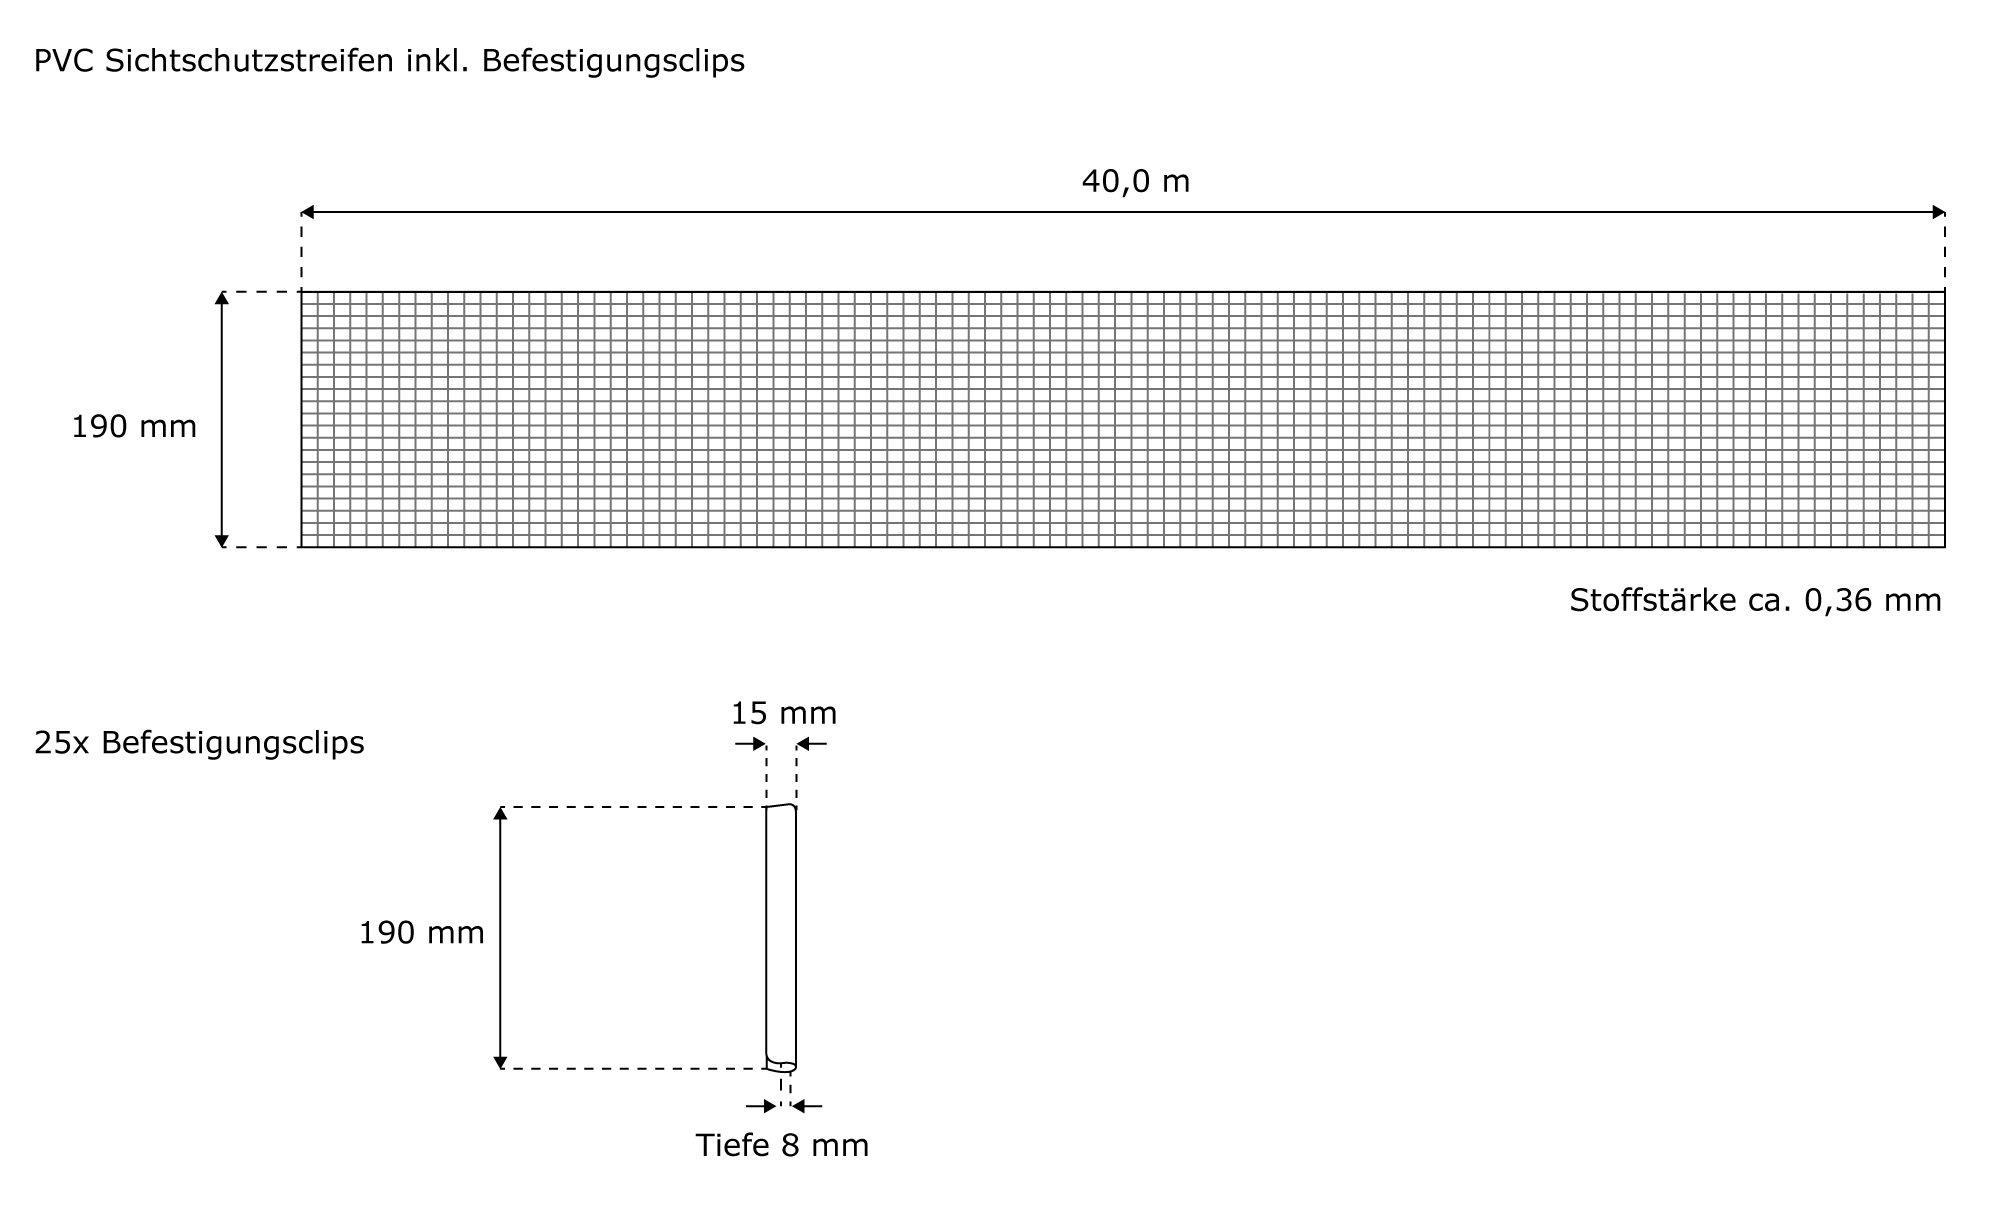 Jarolift PVC Sichschutzstreifen Bedarf an Material und Anzahl der Rollen a40m